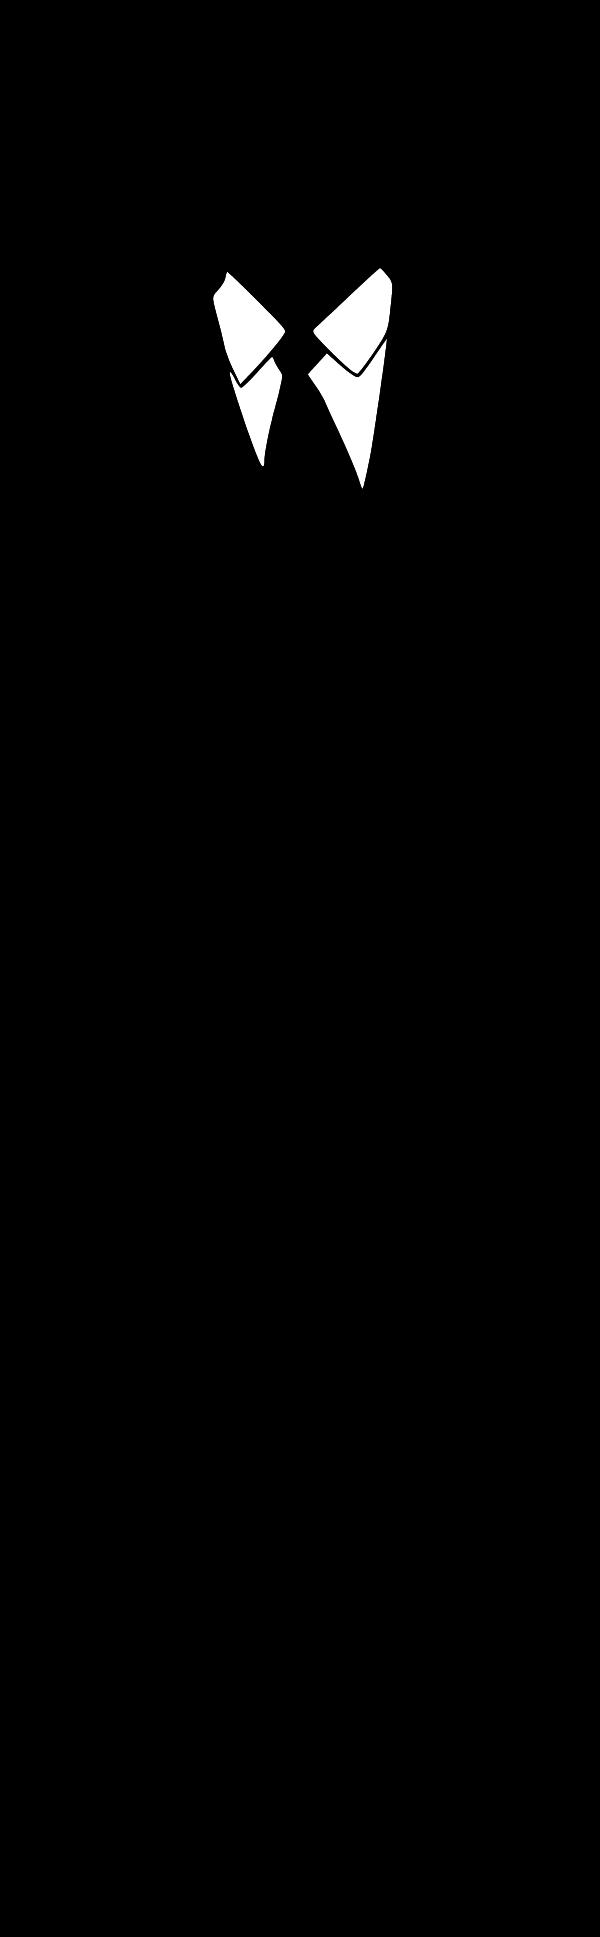 600x1937 Male Silhouette Clipart